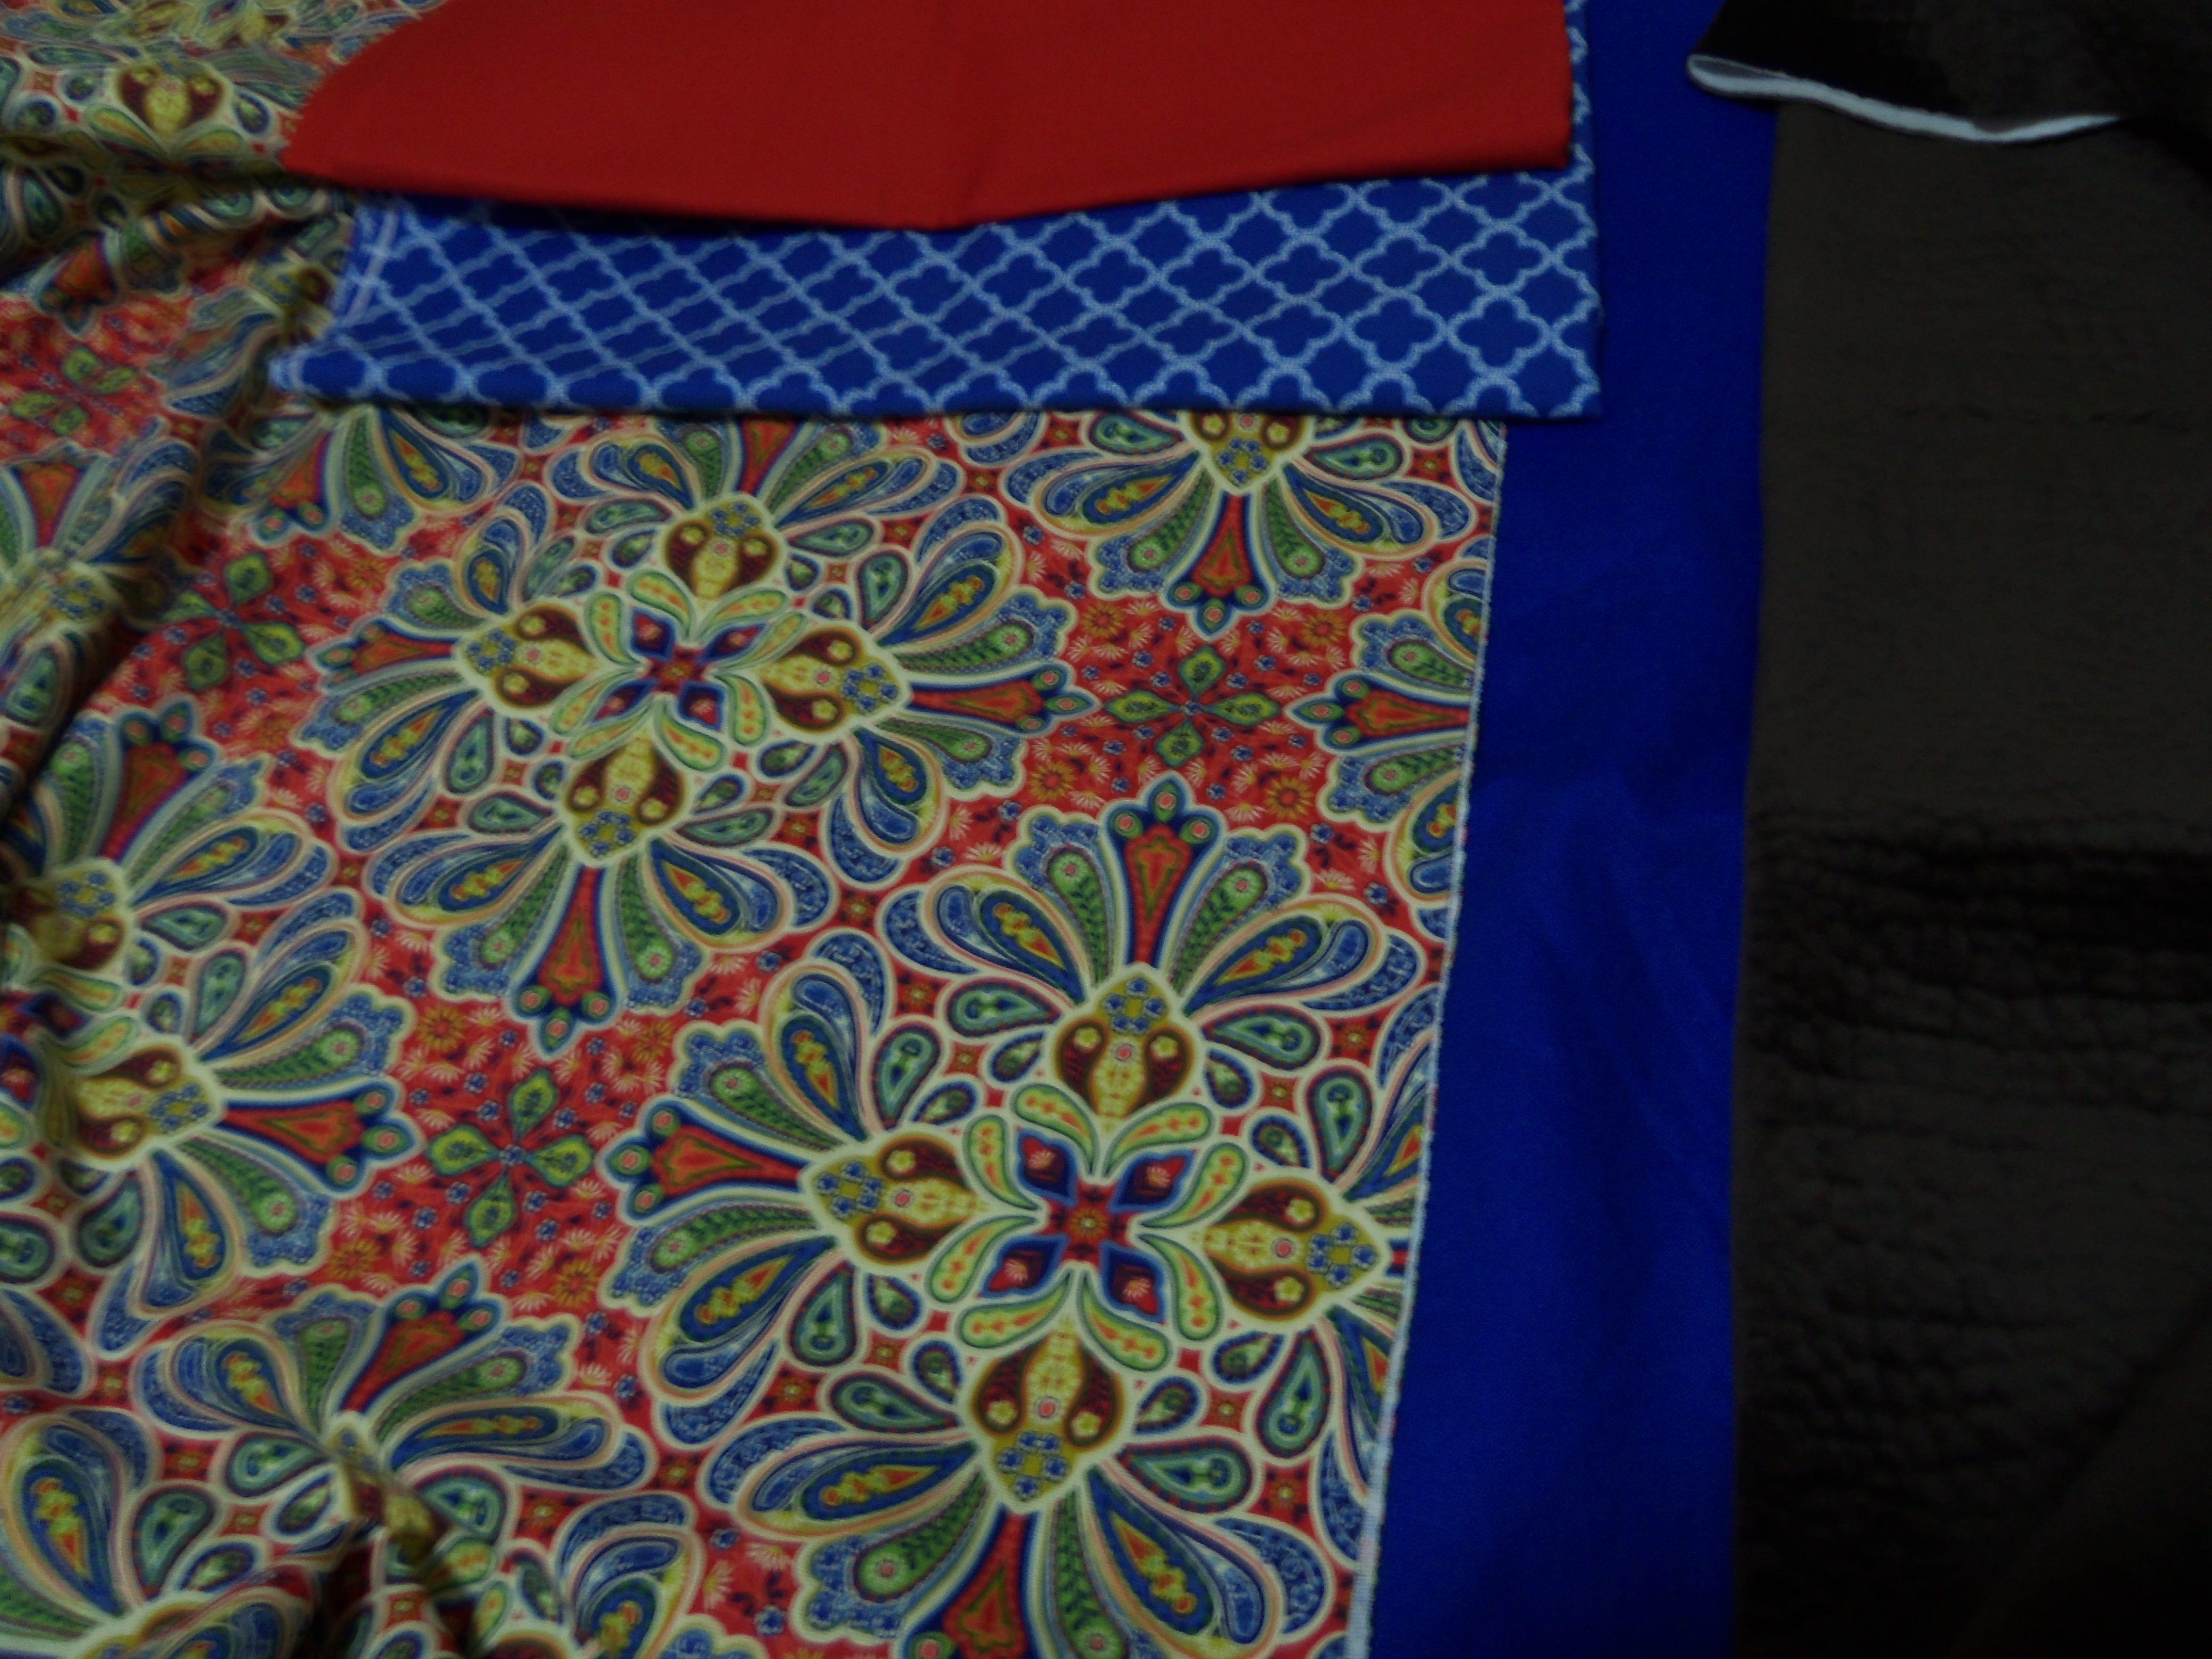 Fabrics From Hancocks Fabrics (Red & Blue Paisley Print Canvas)